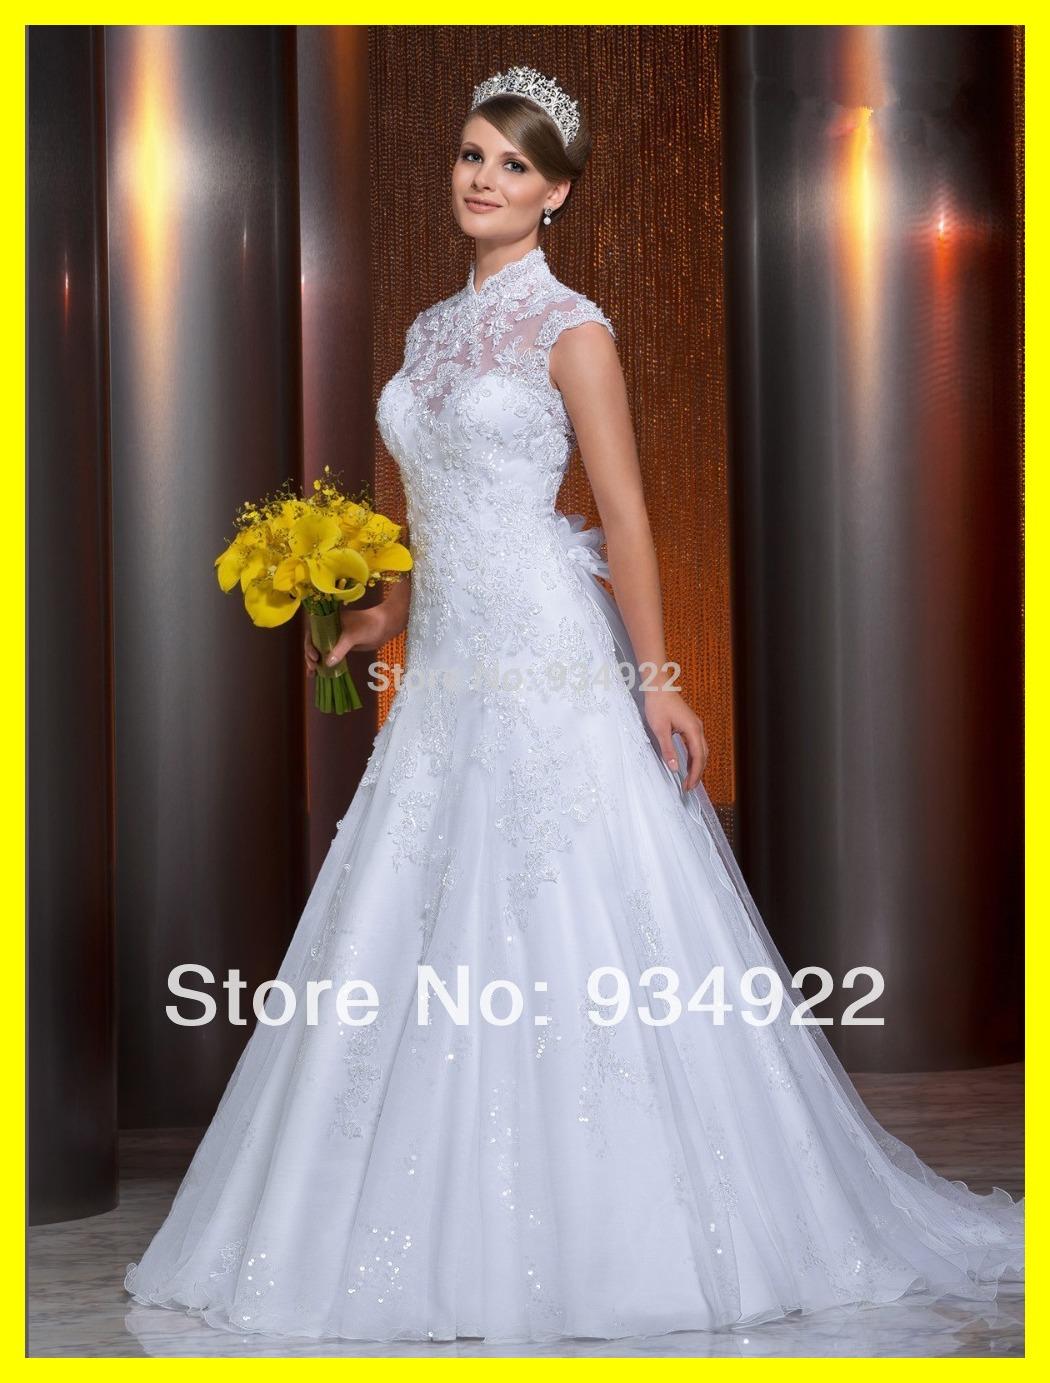 Short wedding dresses uk cotton cute s style dress a line A line lace wedding dress uk